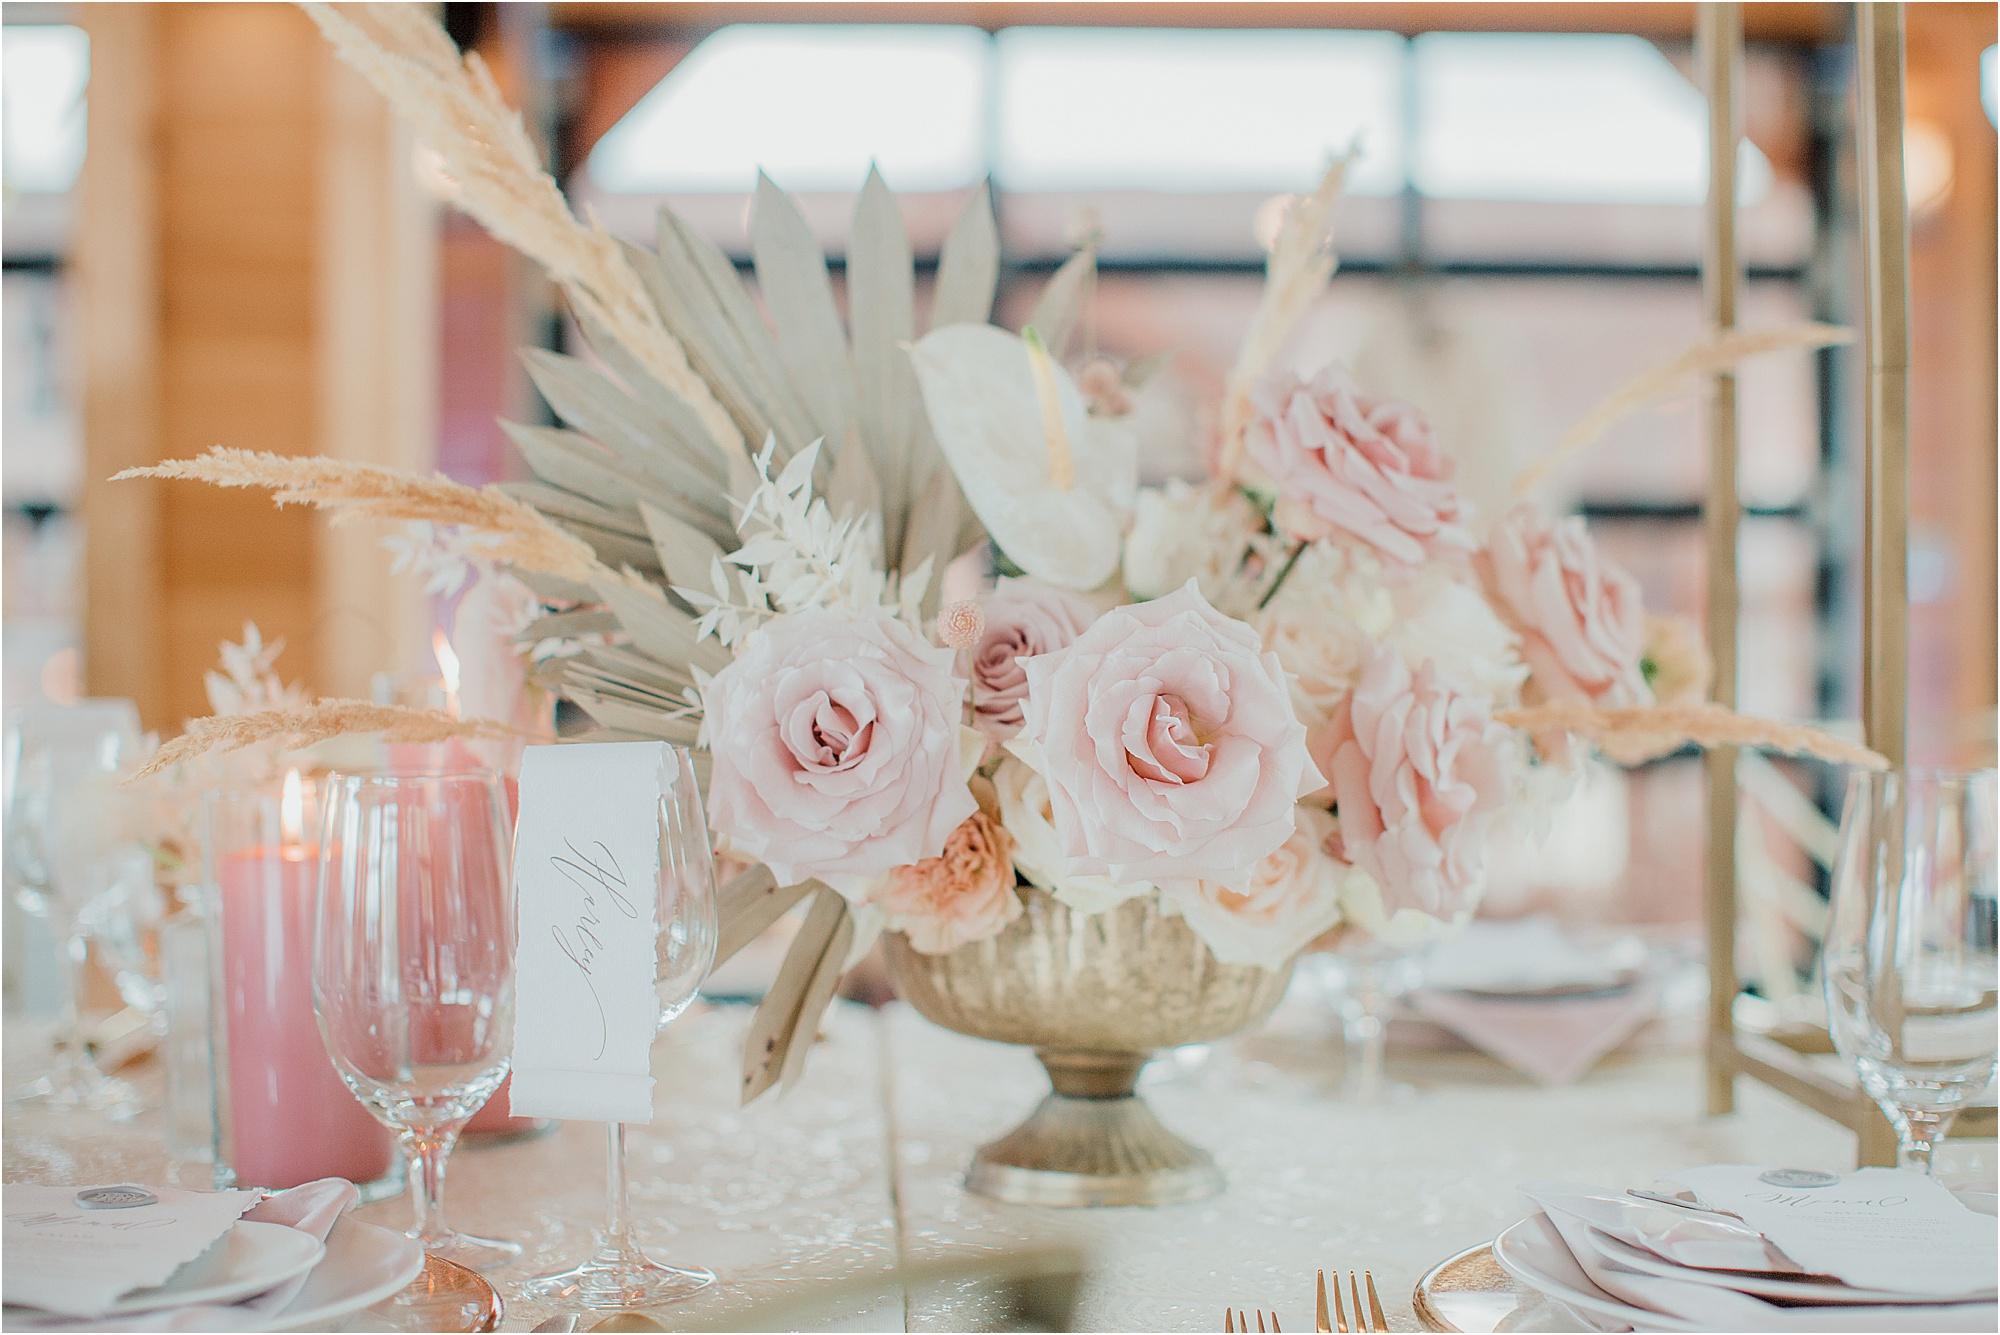 white and blush pink wedding reception centerpieces